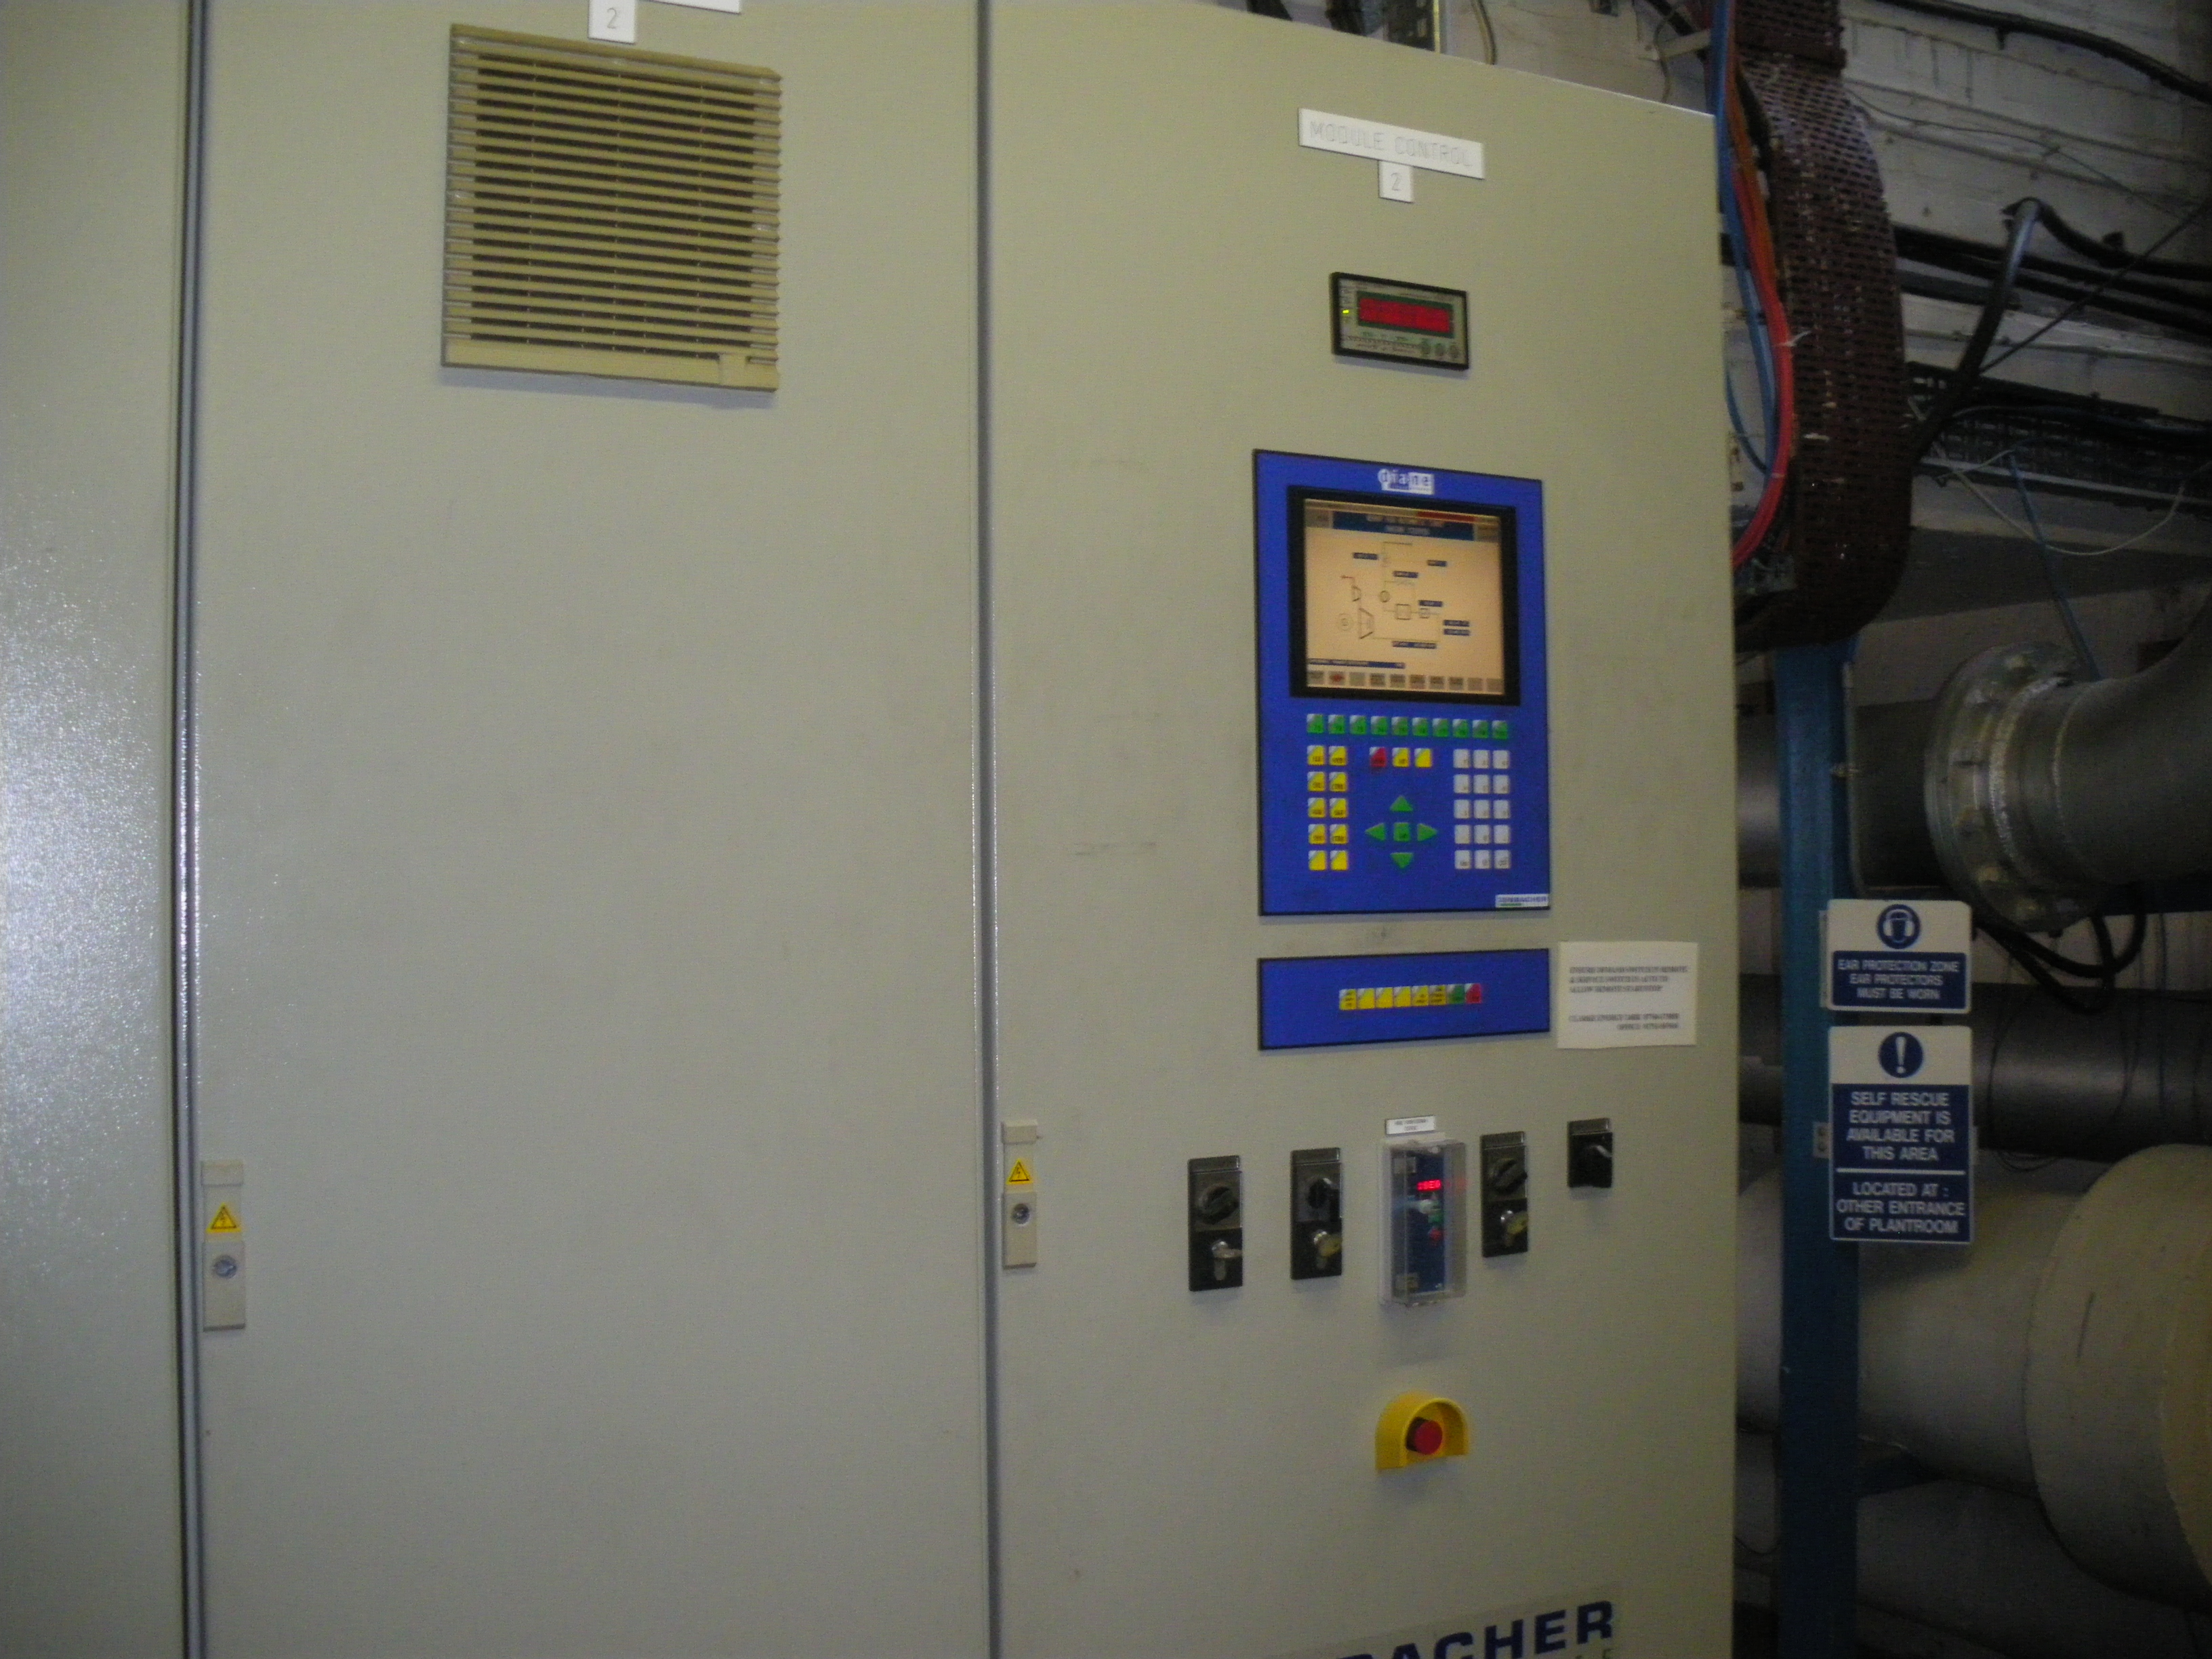 CHP no. 2 control panel